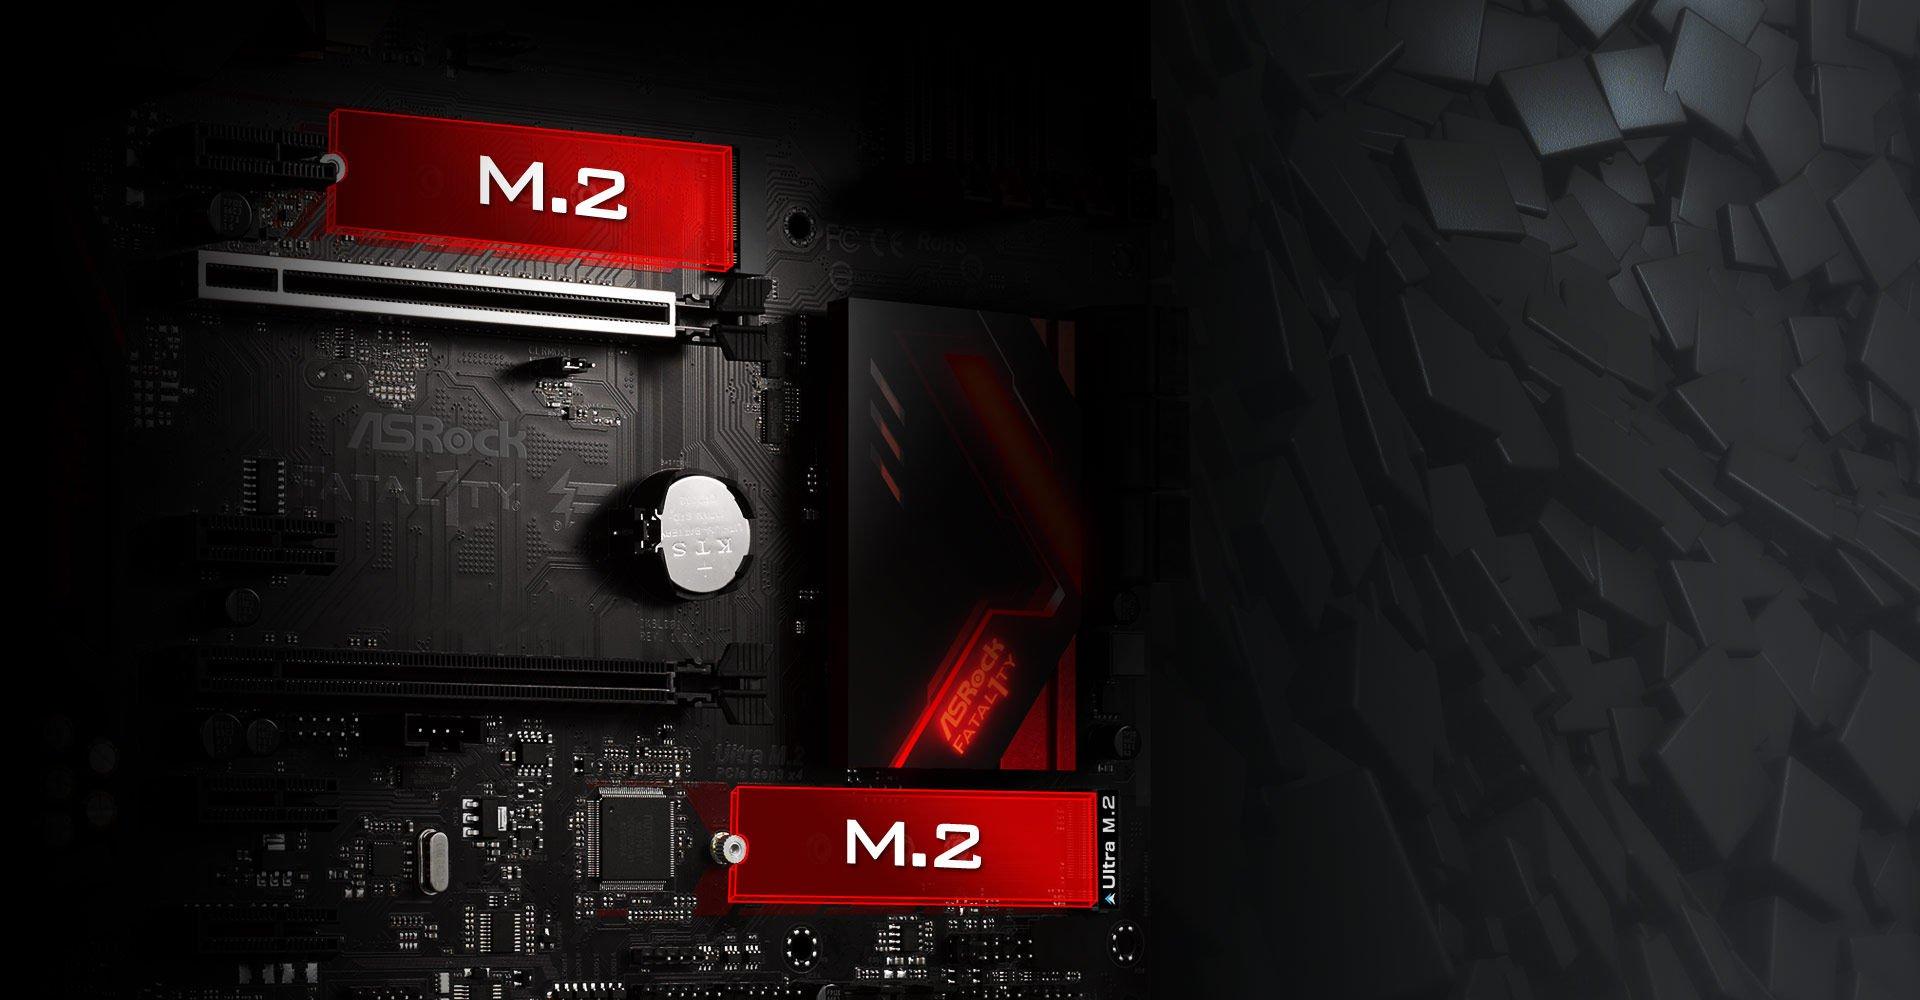 DualM2-SSD-Fatal1ty%20B250%20Gaming%20K4